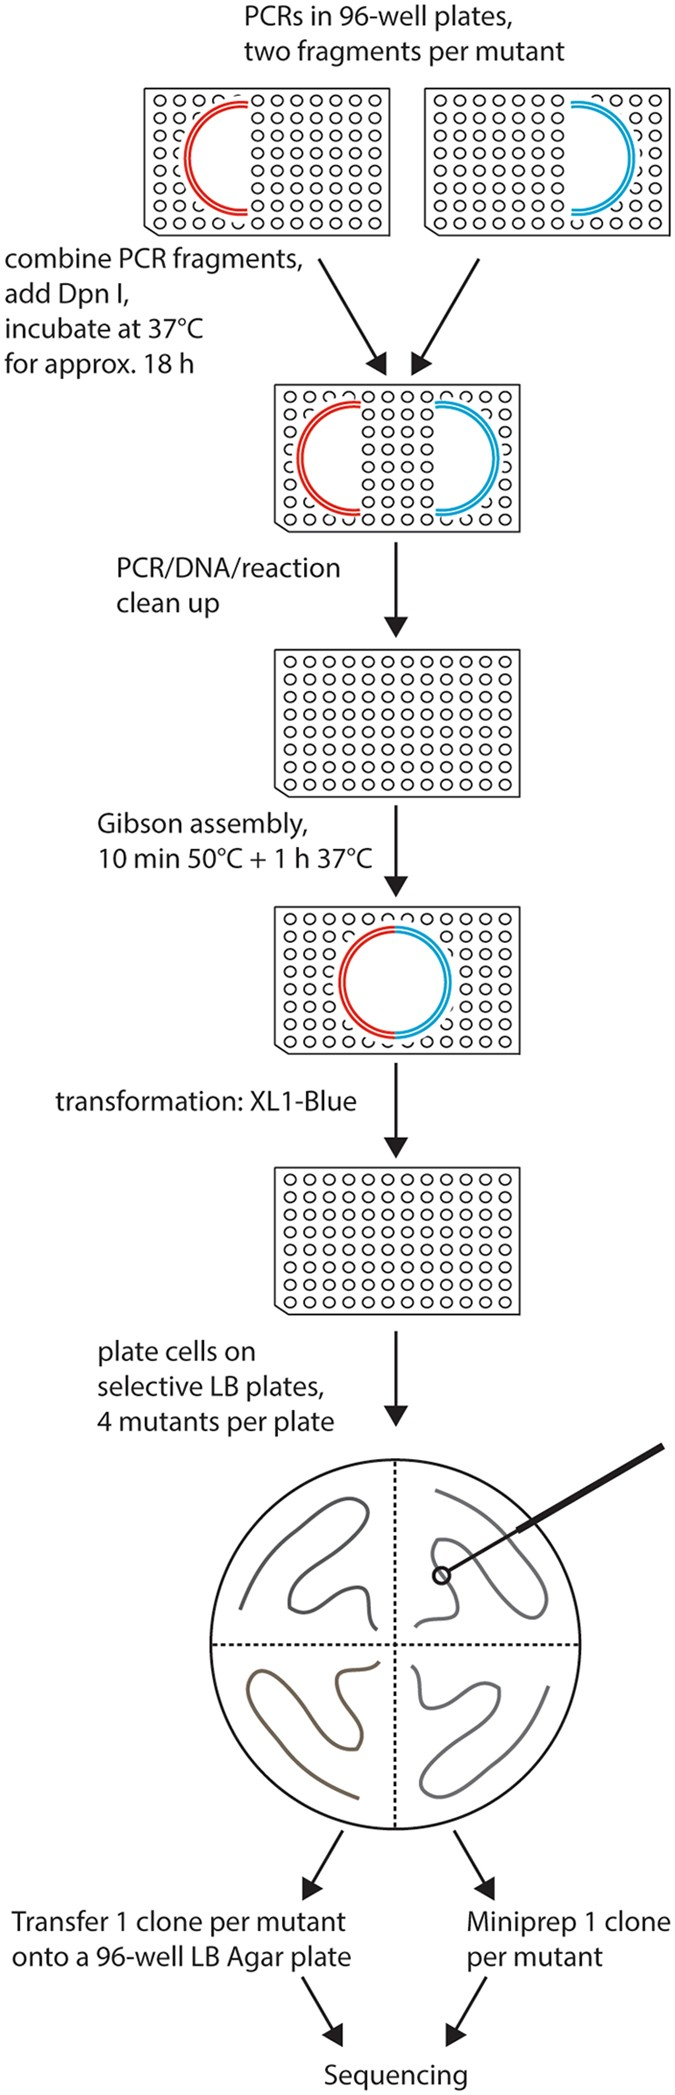 High-throughput mutagenesis using a two-fragment PCR